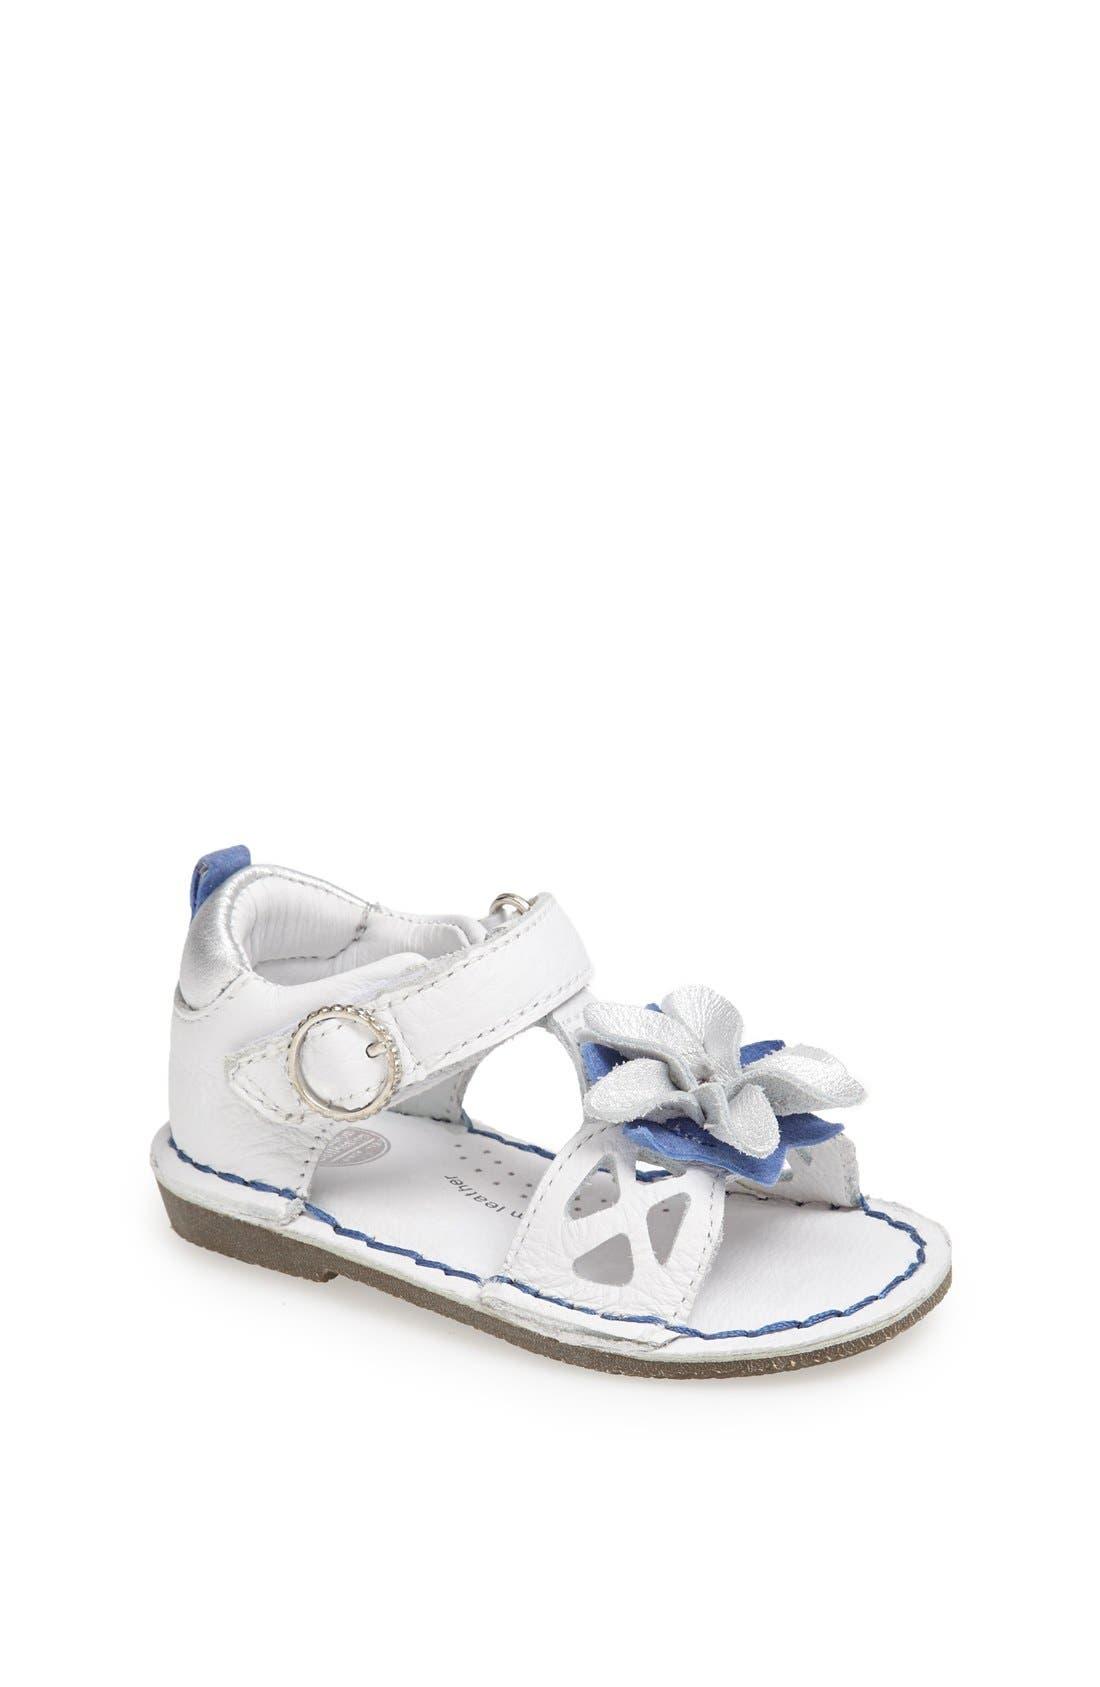 Main Image - Stride Rite 'Haven' Sandal (Baby, Walker & Toddler)